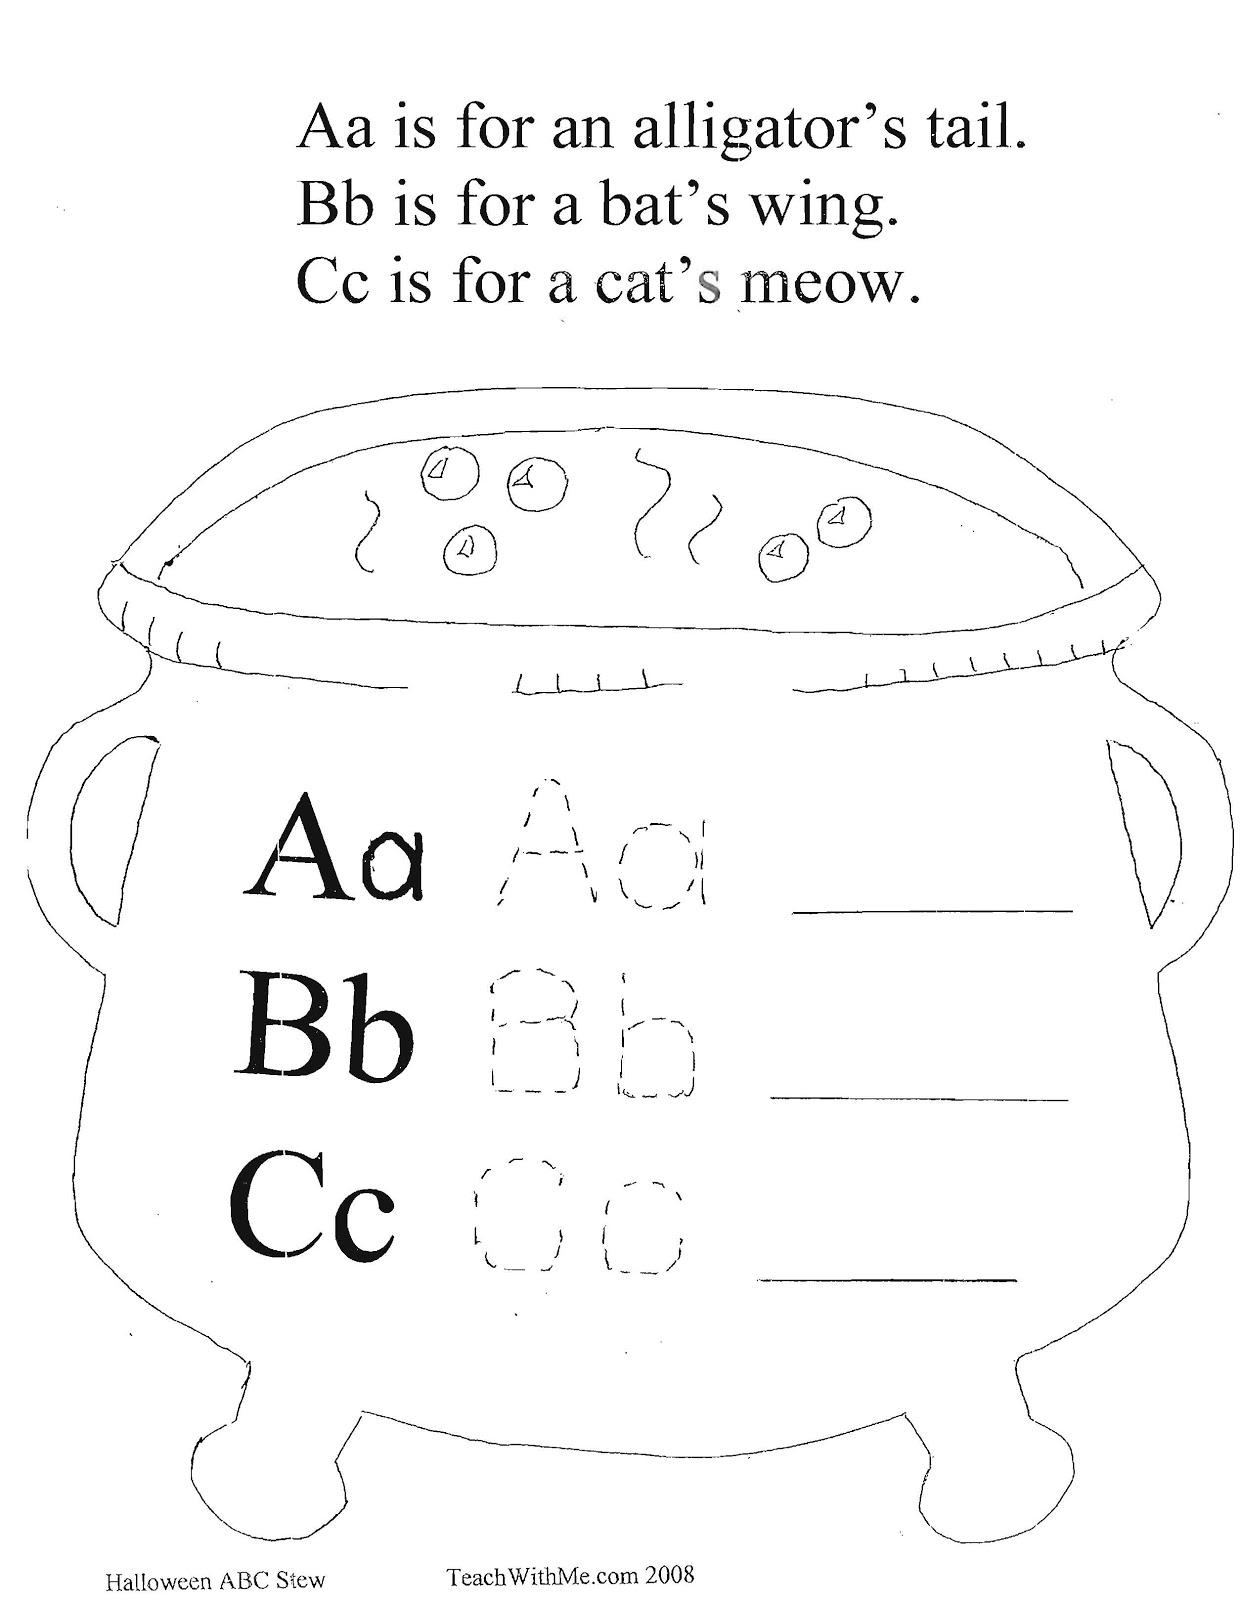 Classroom Freebies Halloween Alphabet Stew